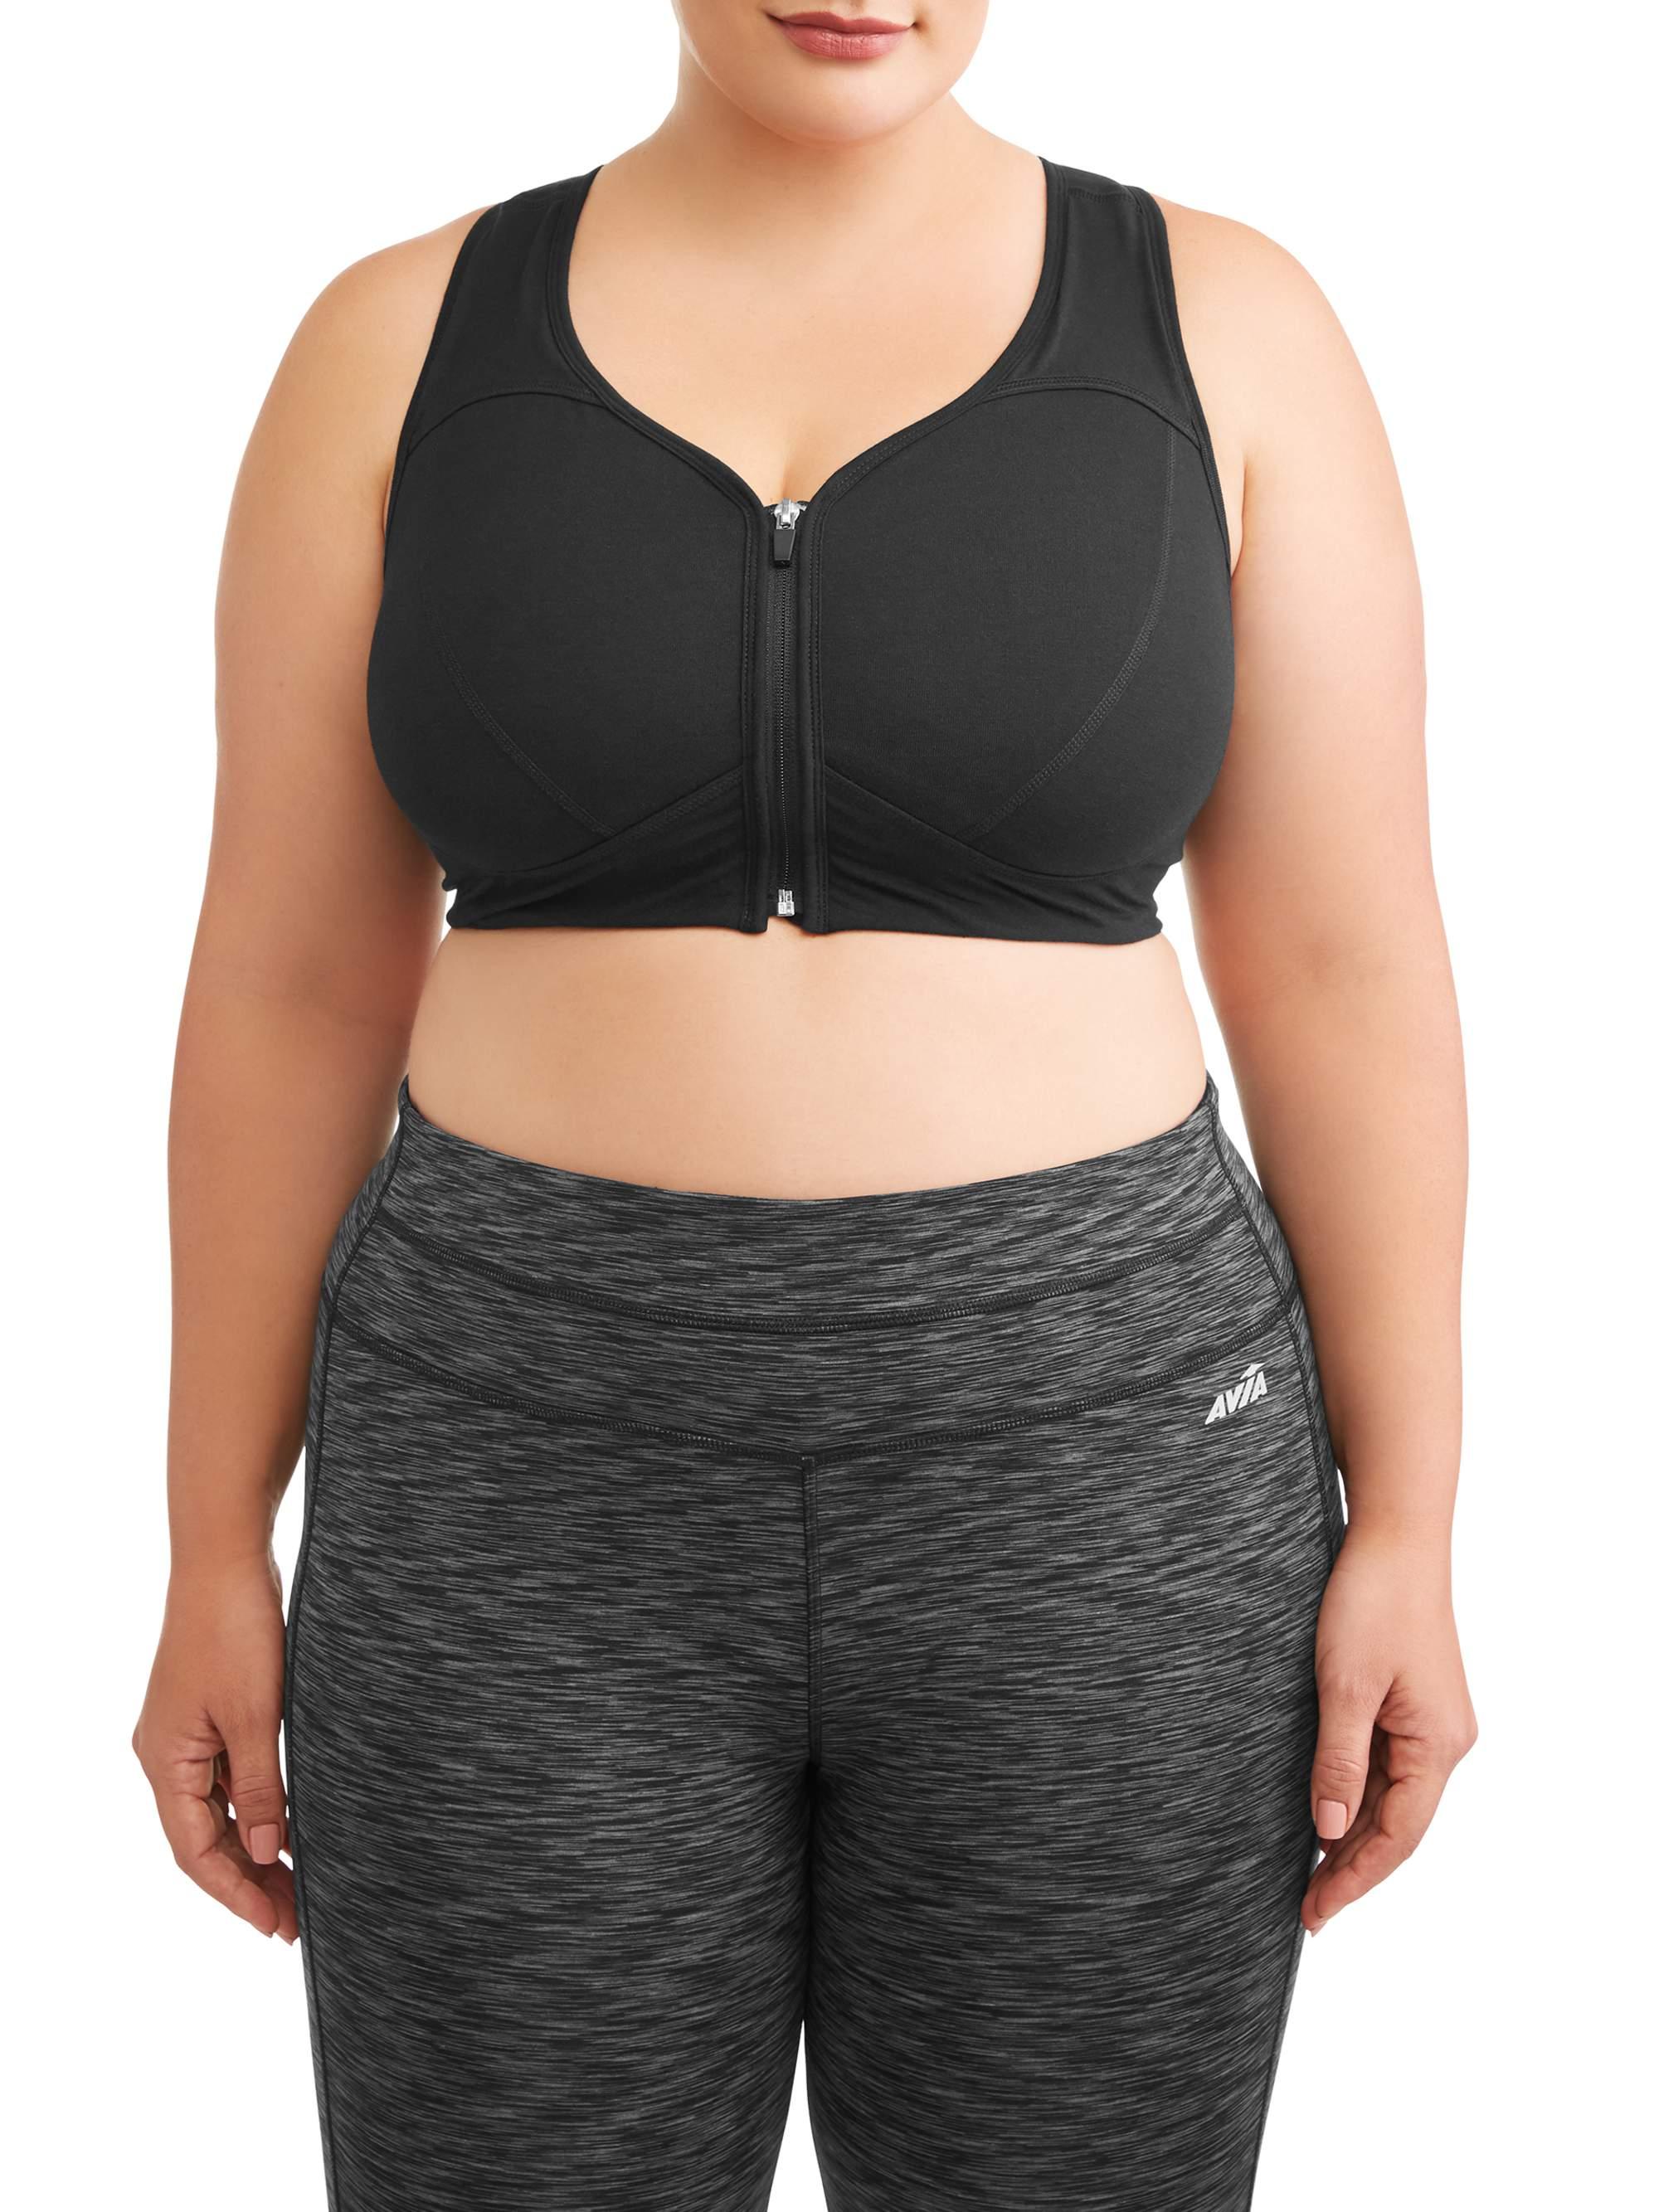 Athletic Works Women's Plus Zip Front Bra